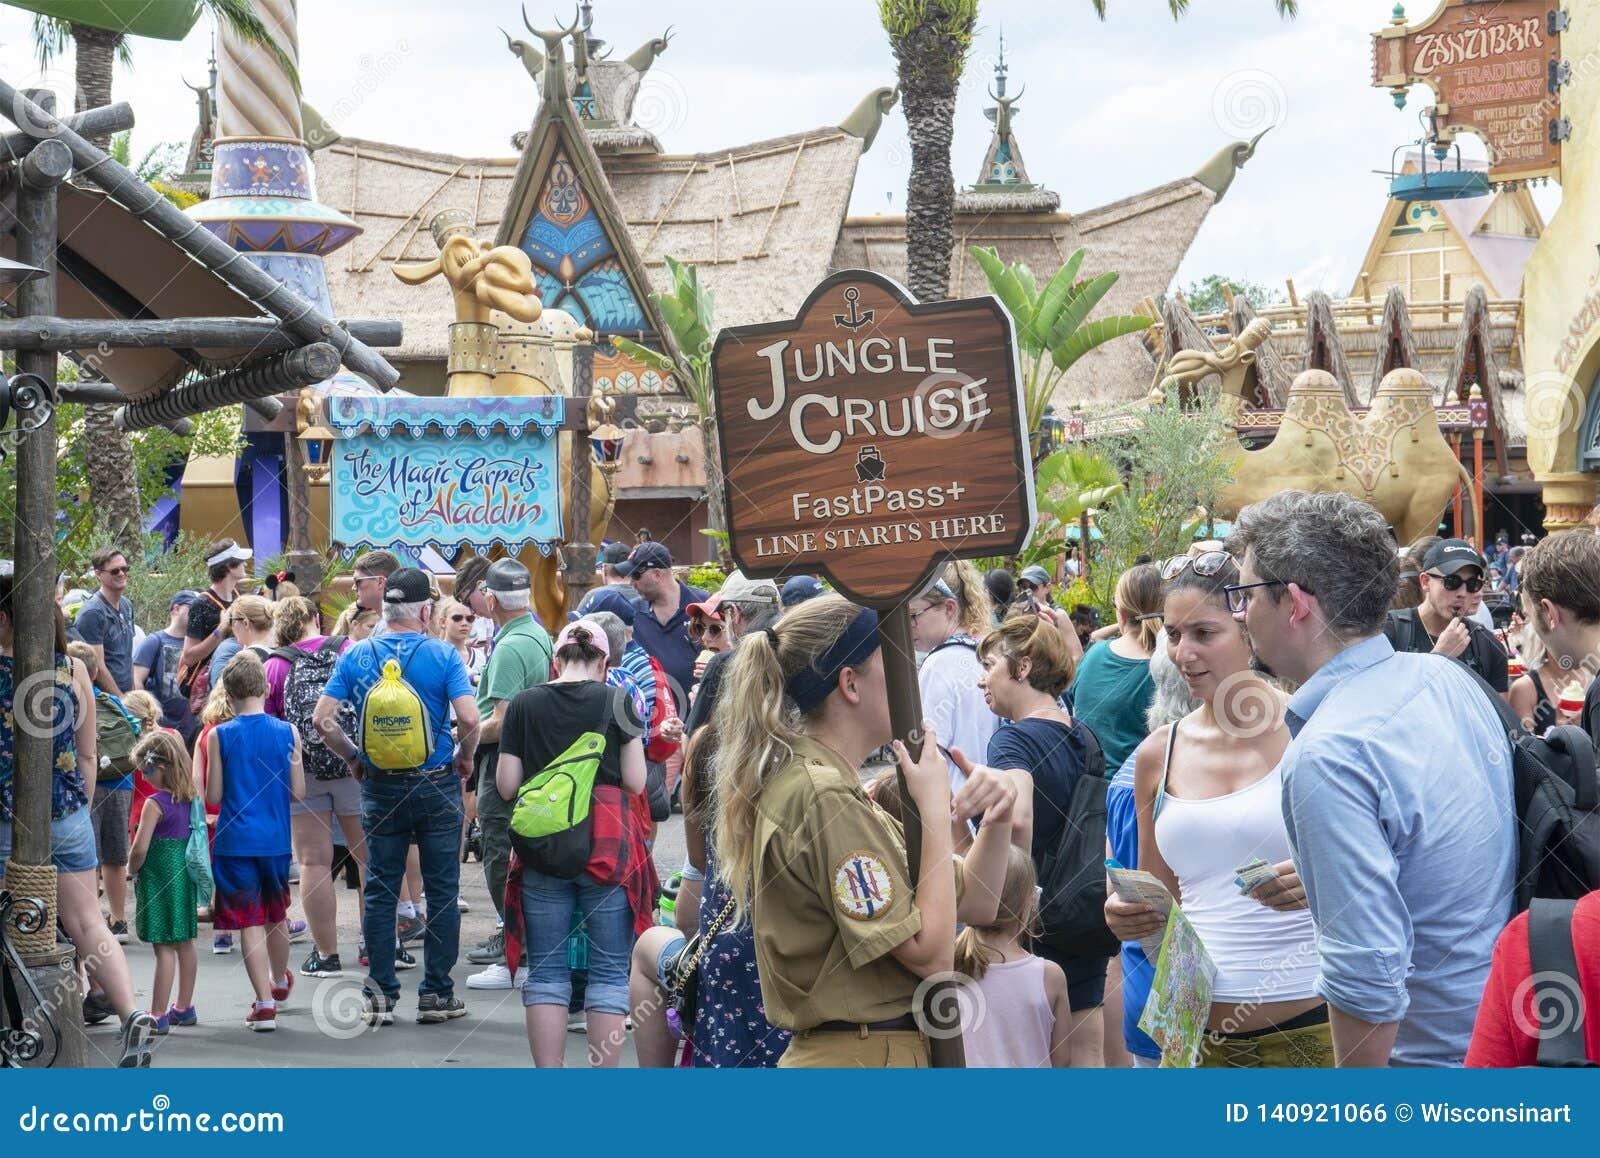 Línea de cruceros de la selva, Disney World, viaje, reino mágico